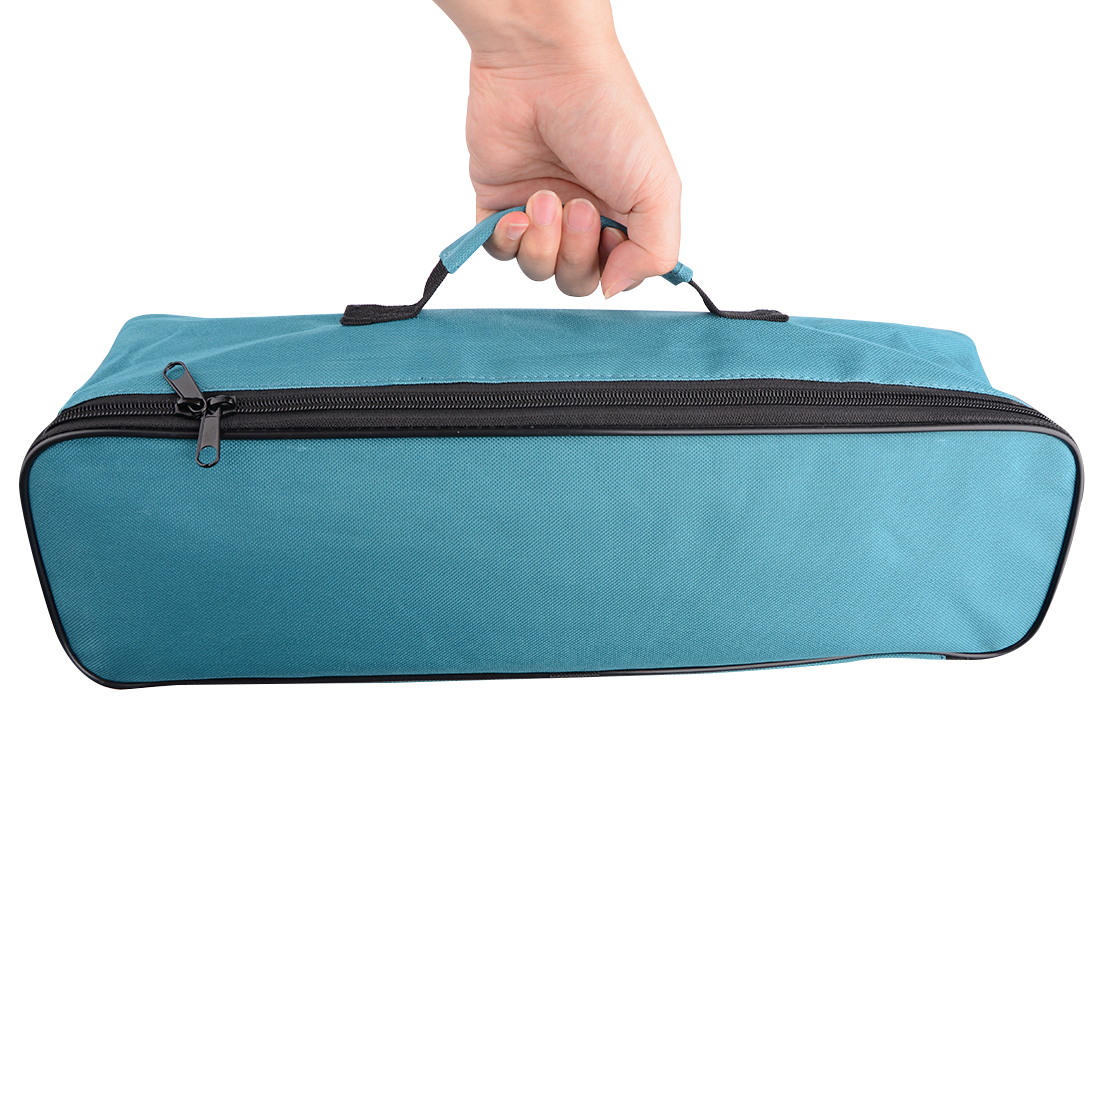 Instrument Case Oxford Canvas Storage Hand Tool Bag Screws Nails Drill Bit Metal Parts Fishing Travel  Multi-function Tool Belt